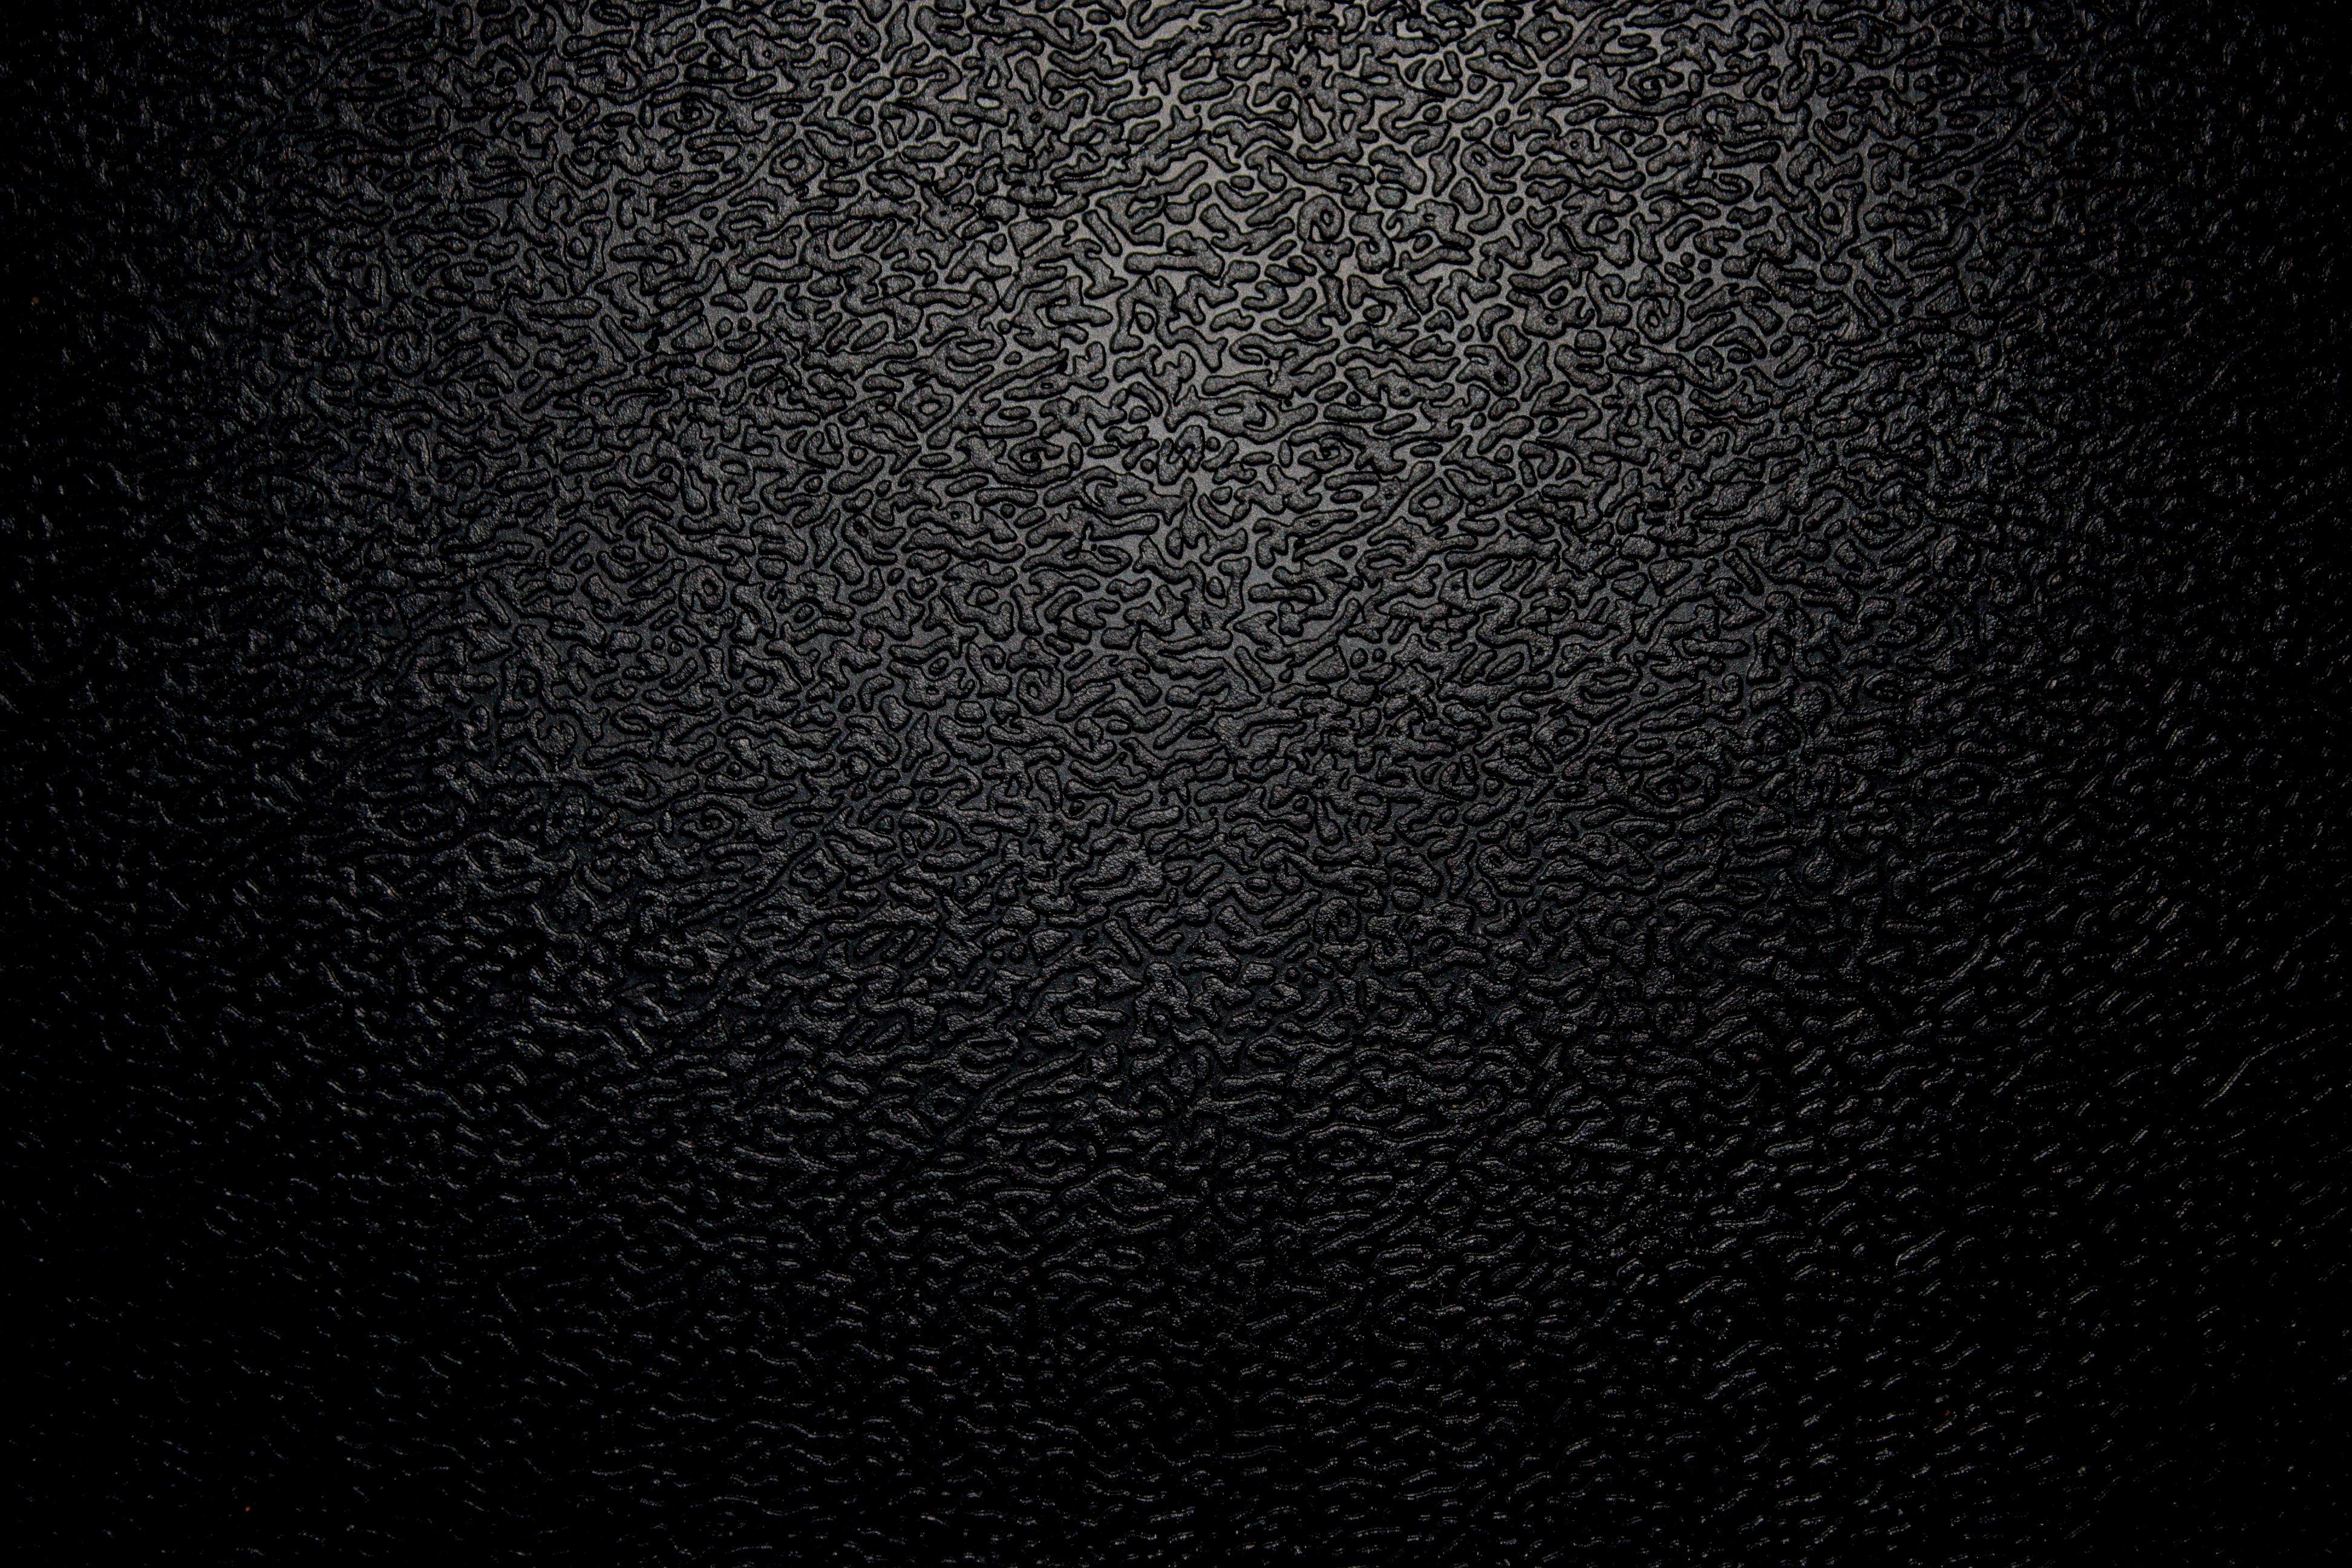 Vinyl Flooring Brick Pattern Black Wallpaper Texture - WallpaperSafari